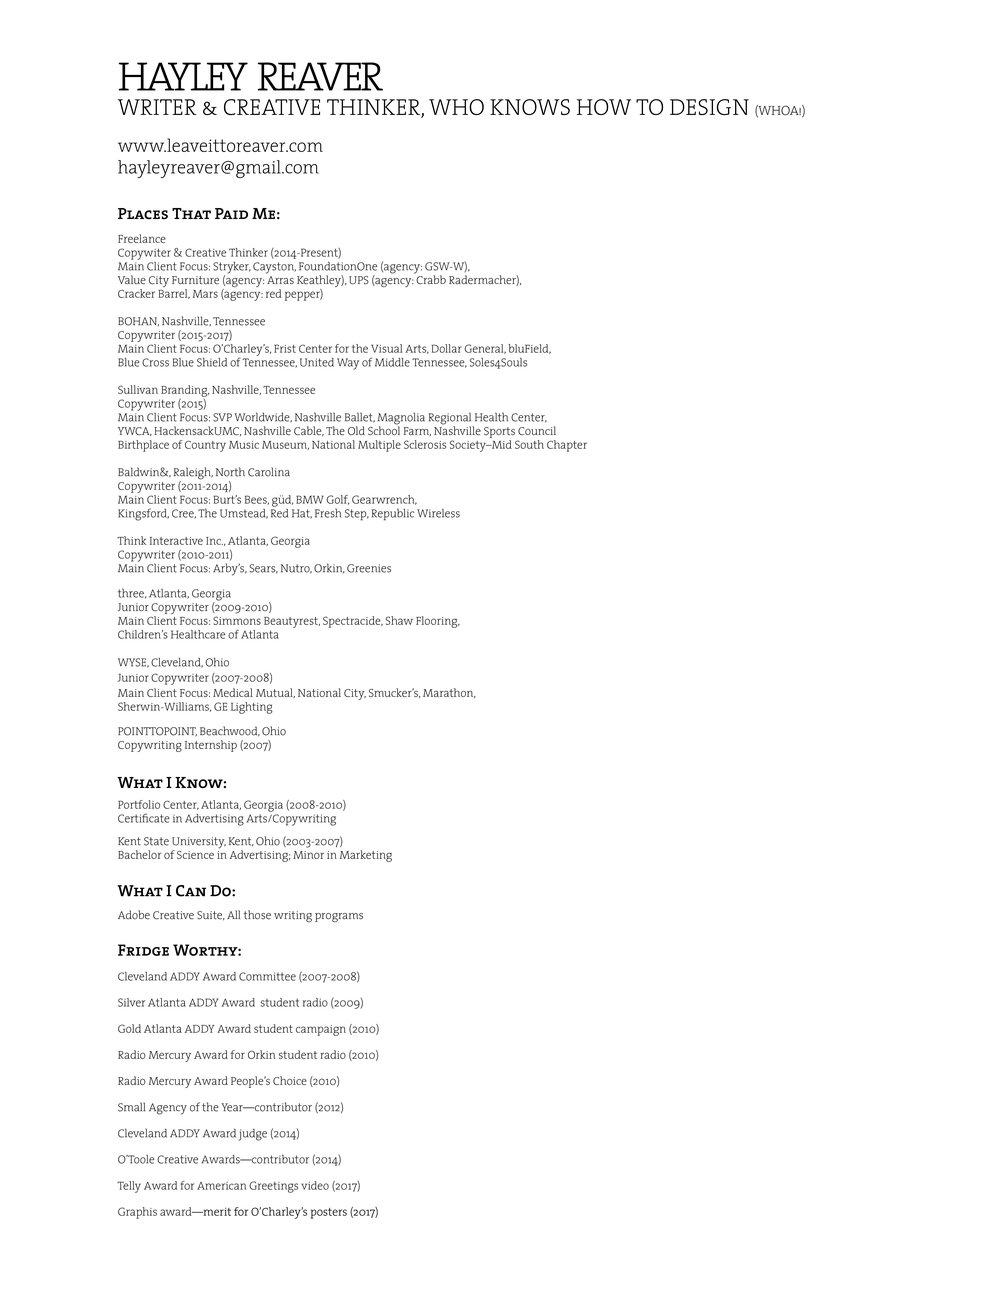 lumaraa dissertation essay topics advertising hamlet act